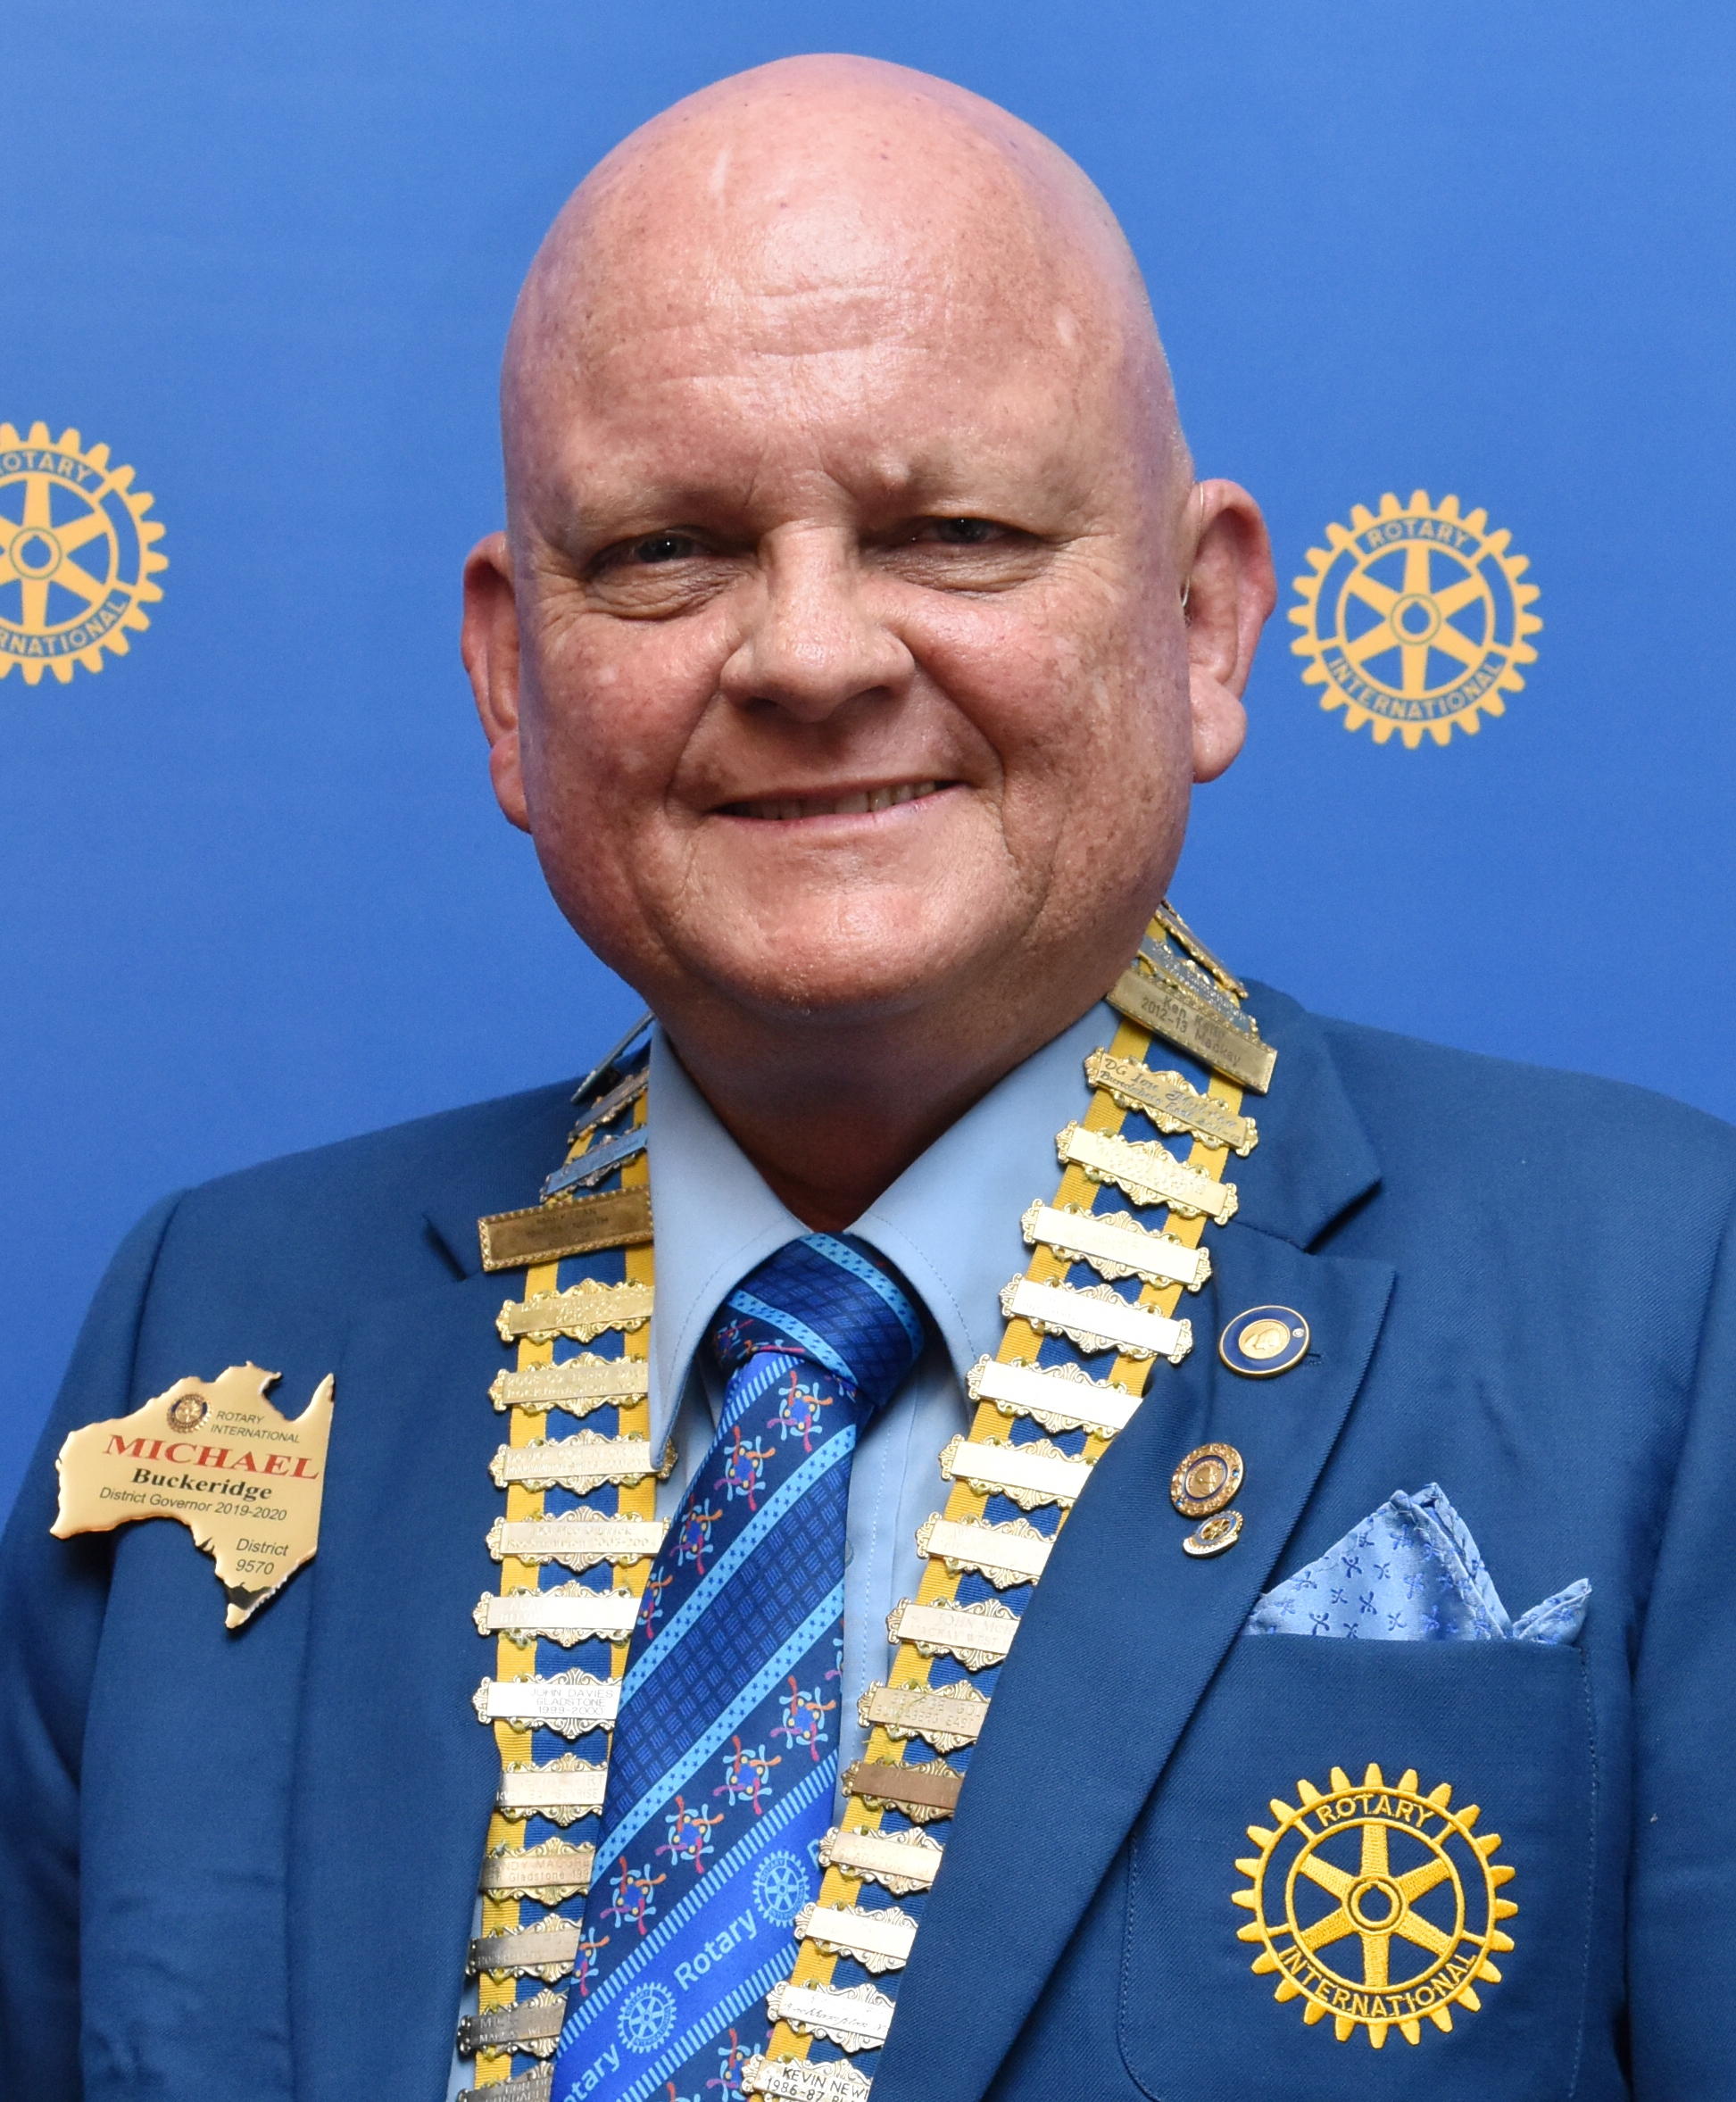 Michael Buckeridge (Immediate Past District Governor)